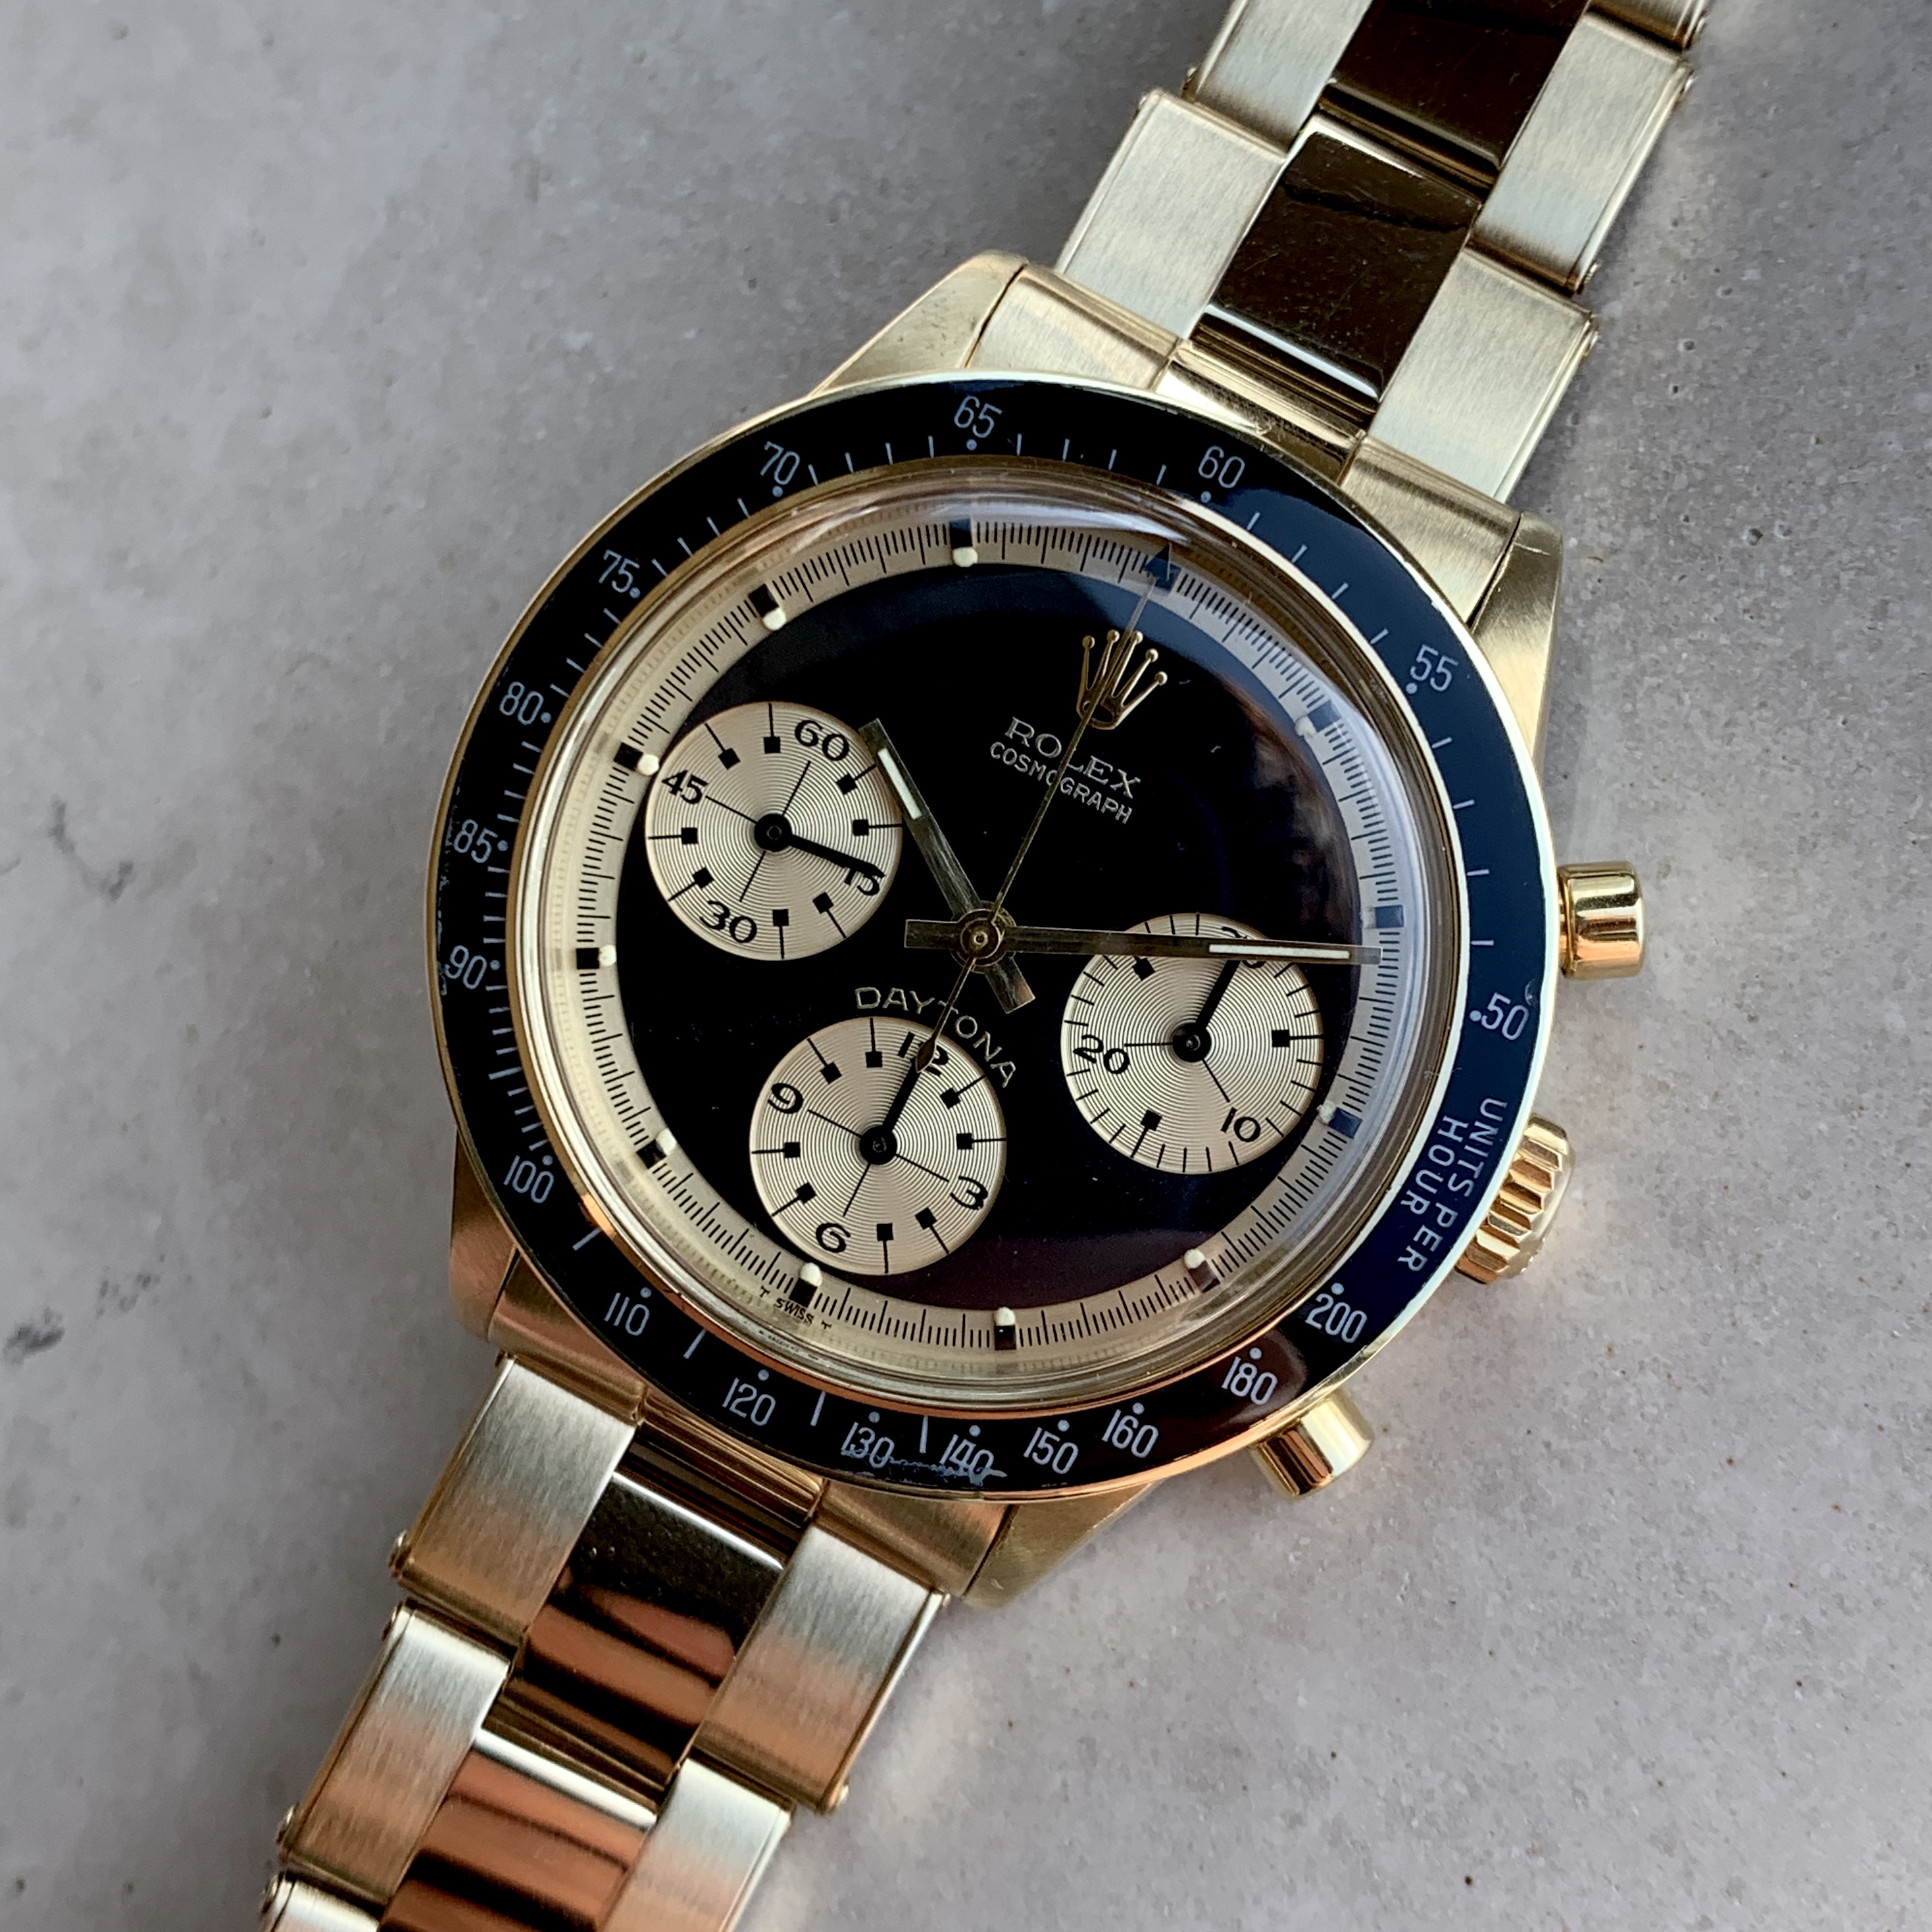 Rolex Ref 6241 JPS 18K Circa 1969 #Status Sold